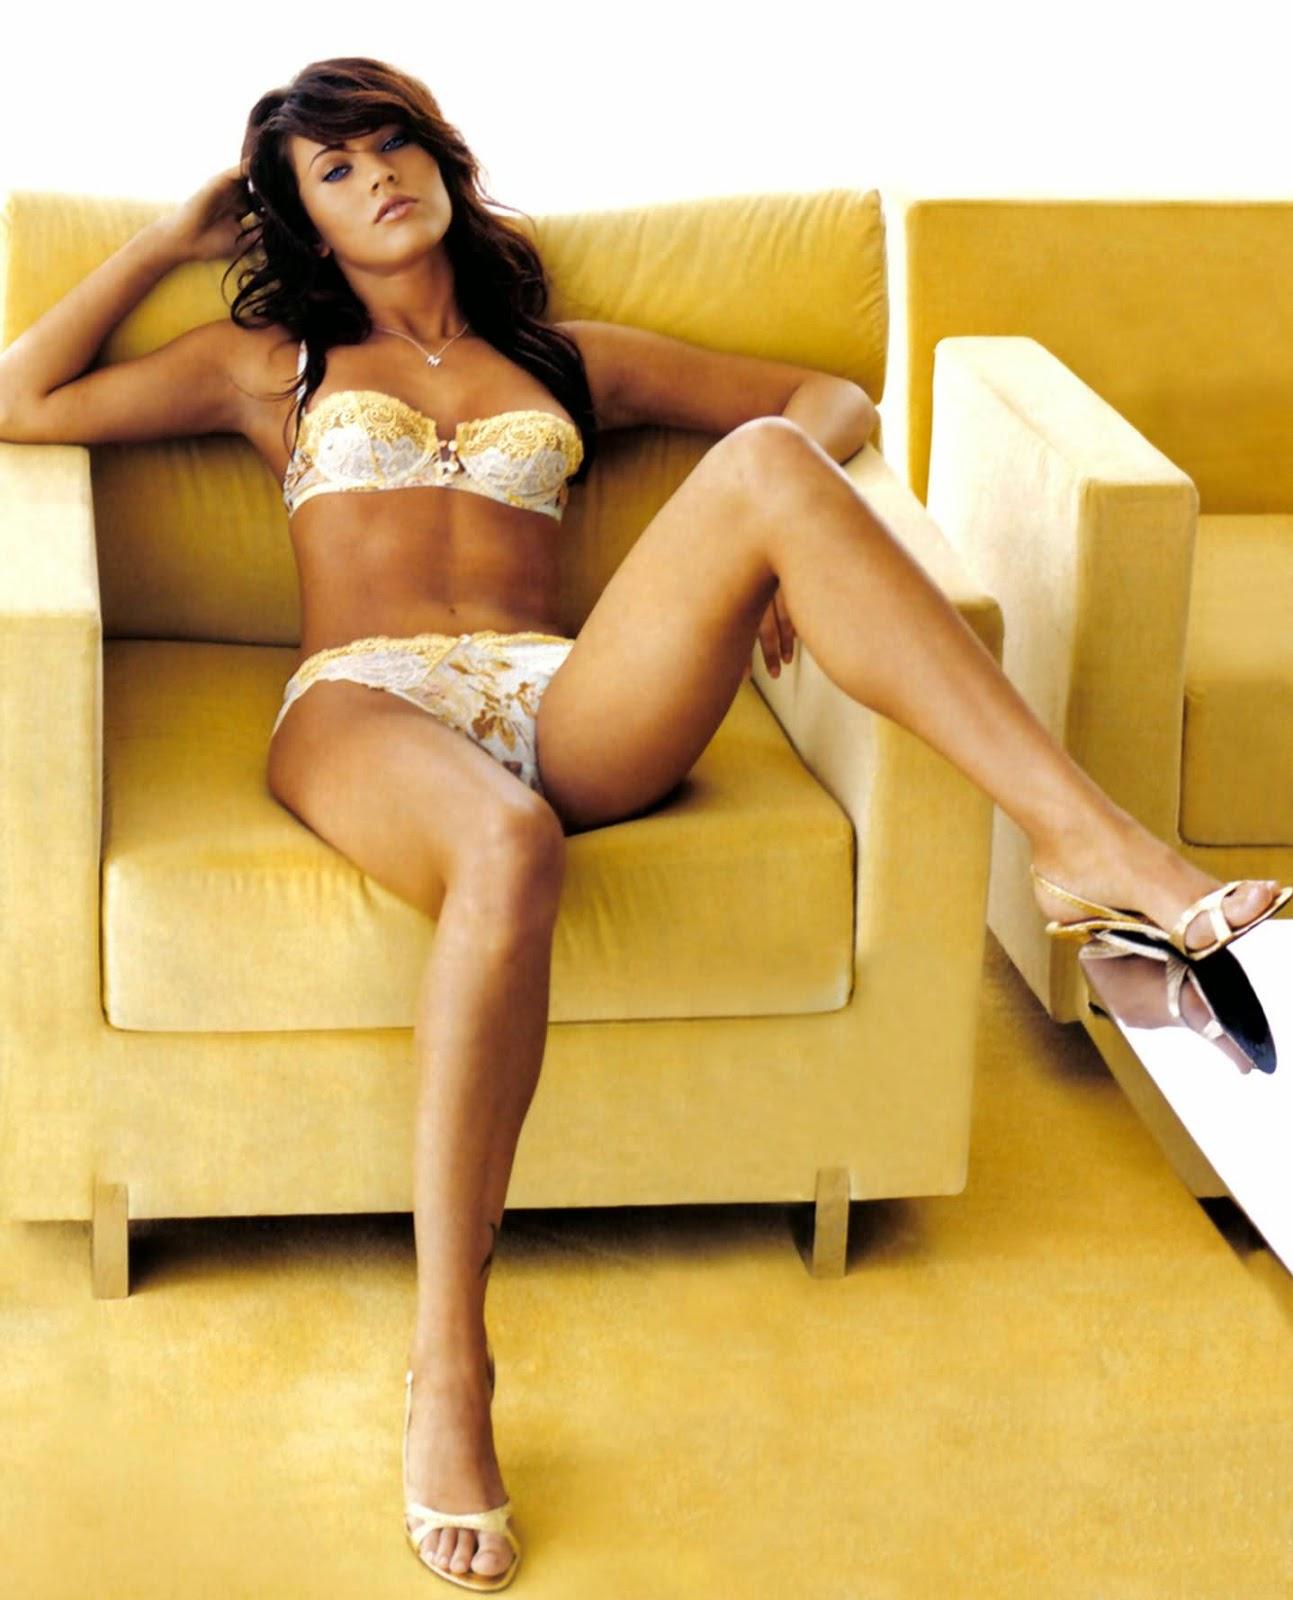 Megan Fox: EBL: Megan Fox Rule 5